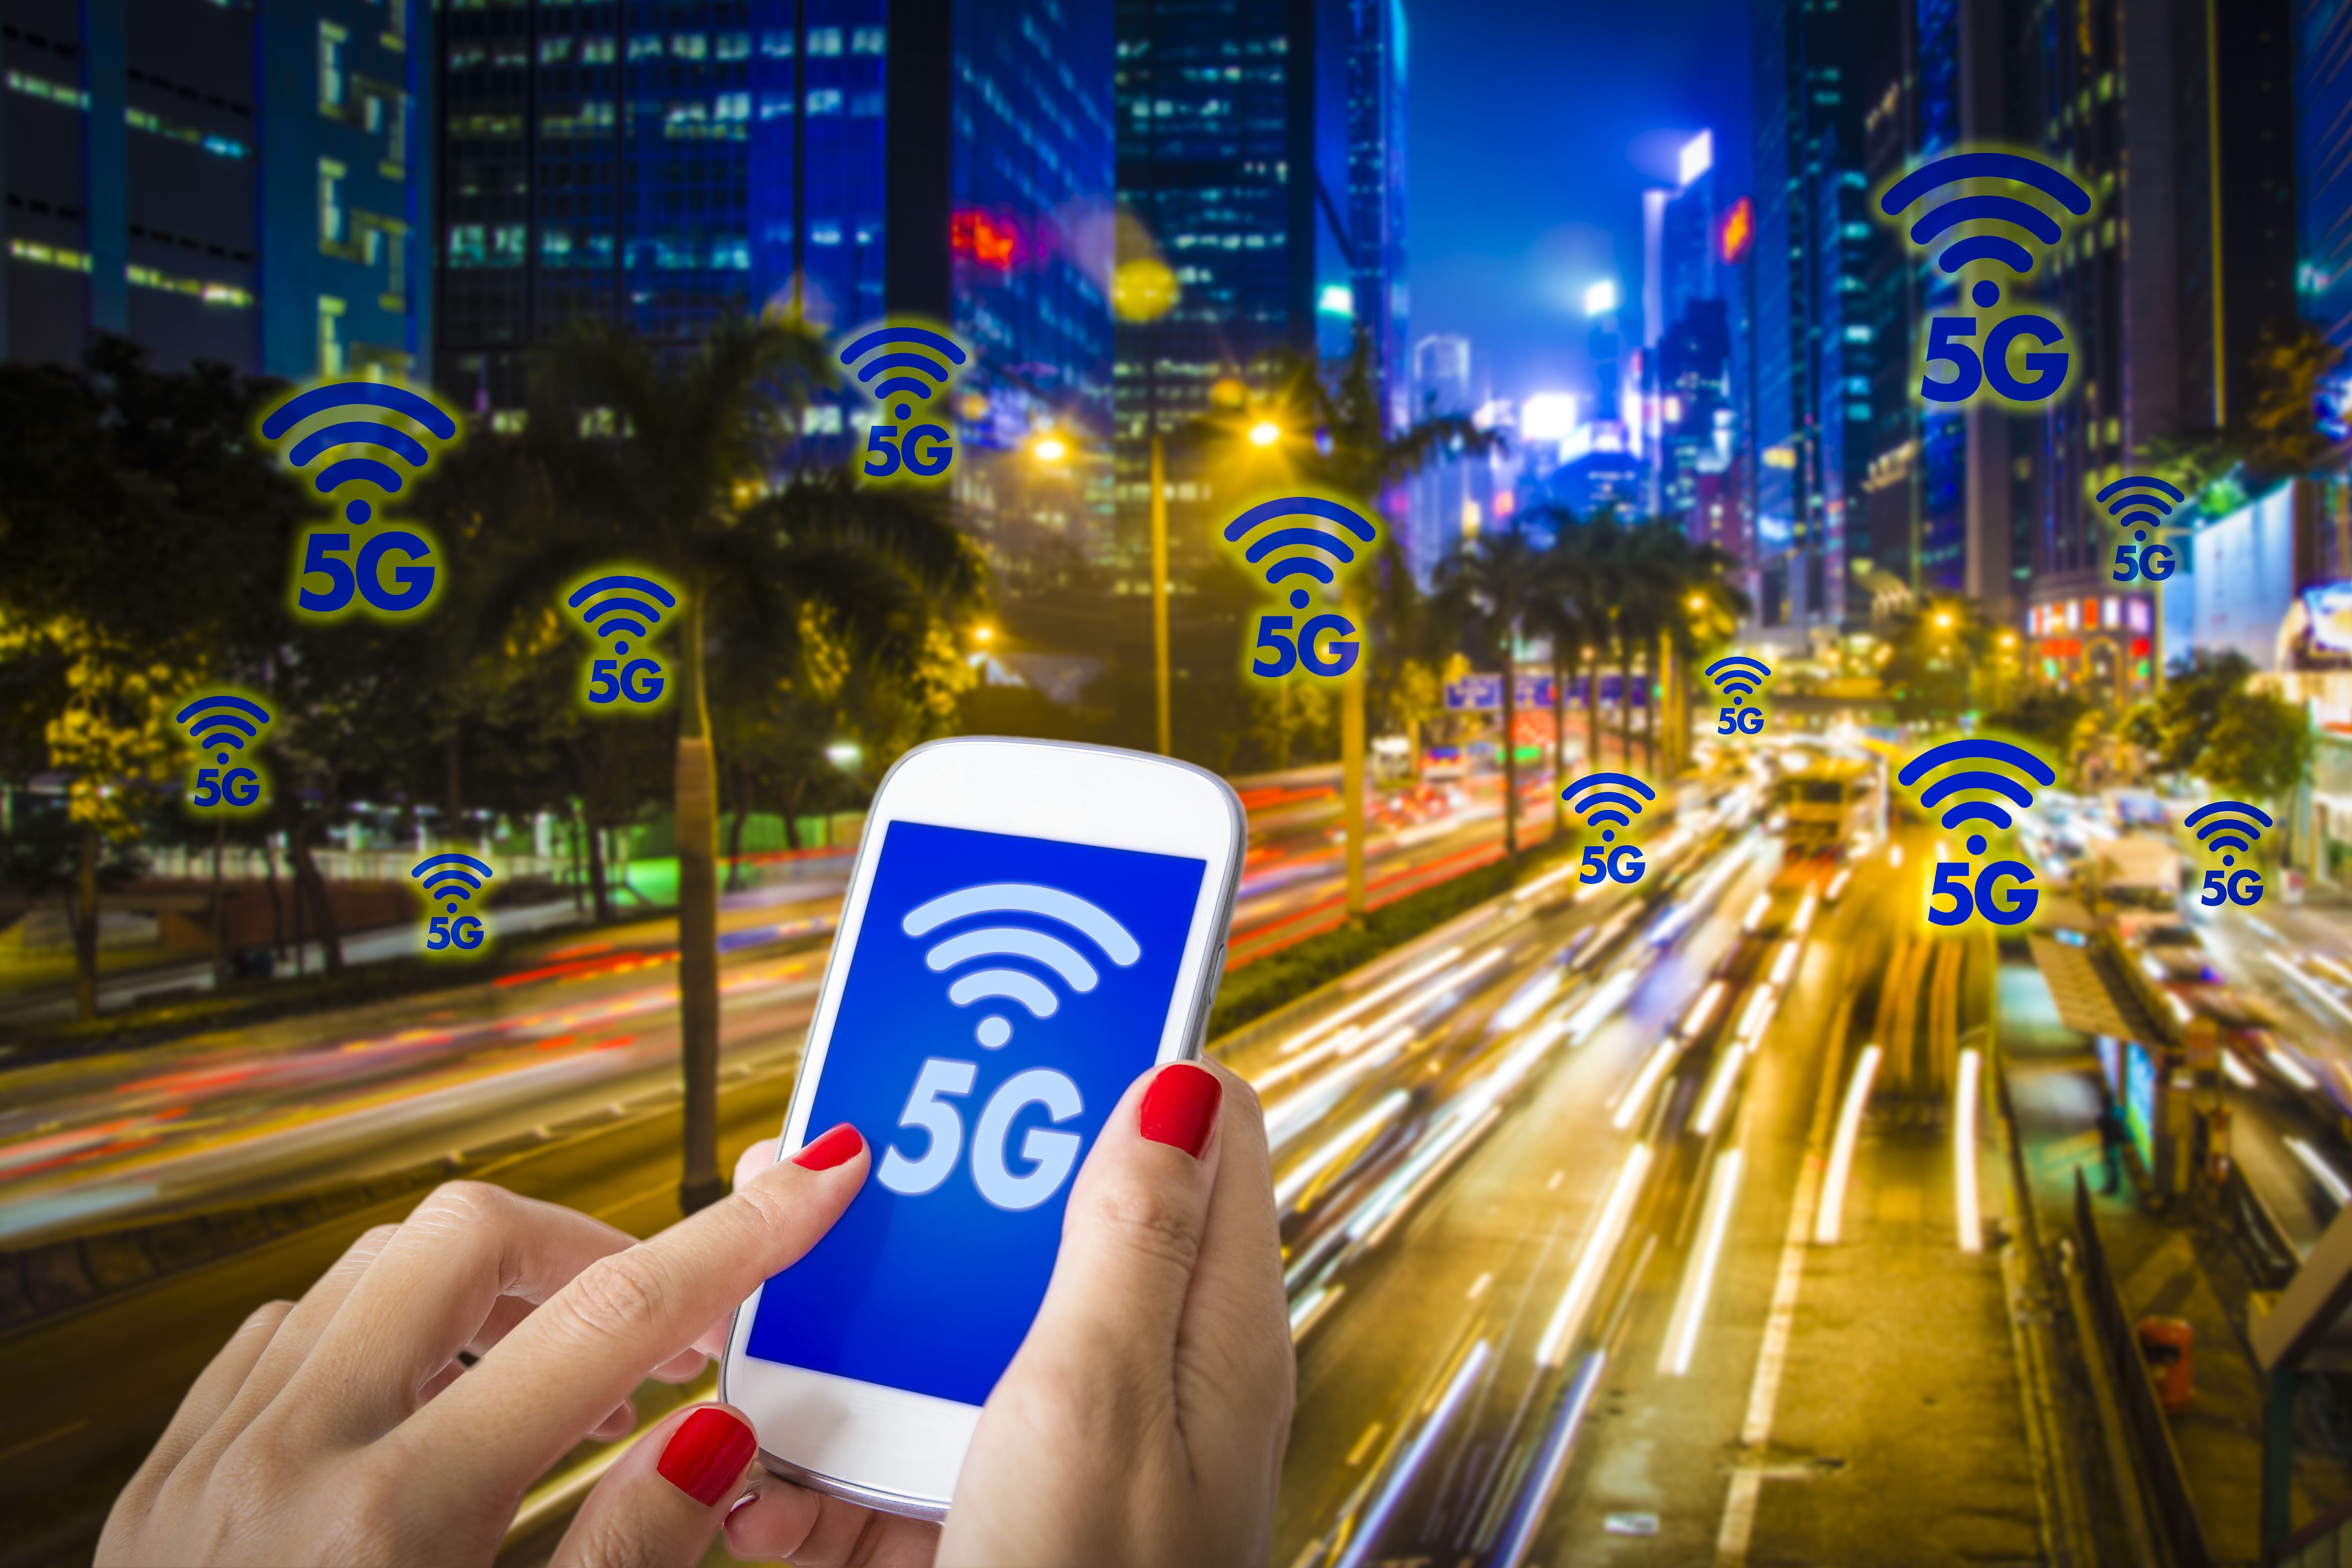 5G普及还需要多久?固定宽带会被5G所替代吗?